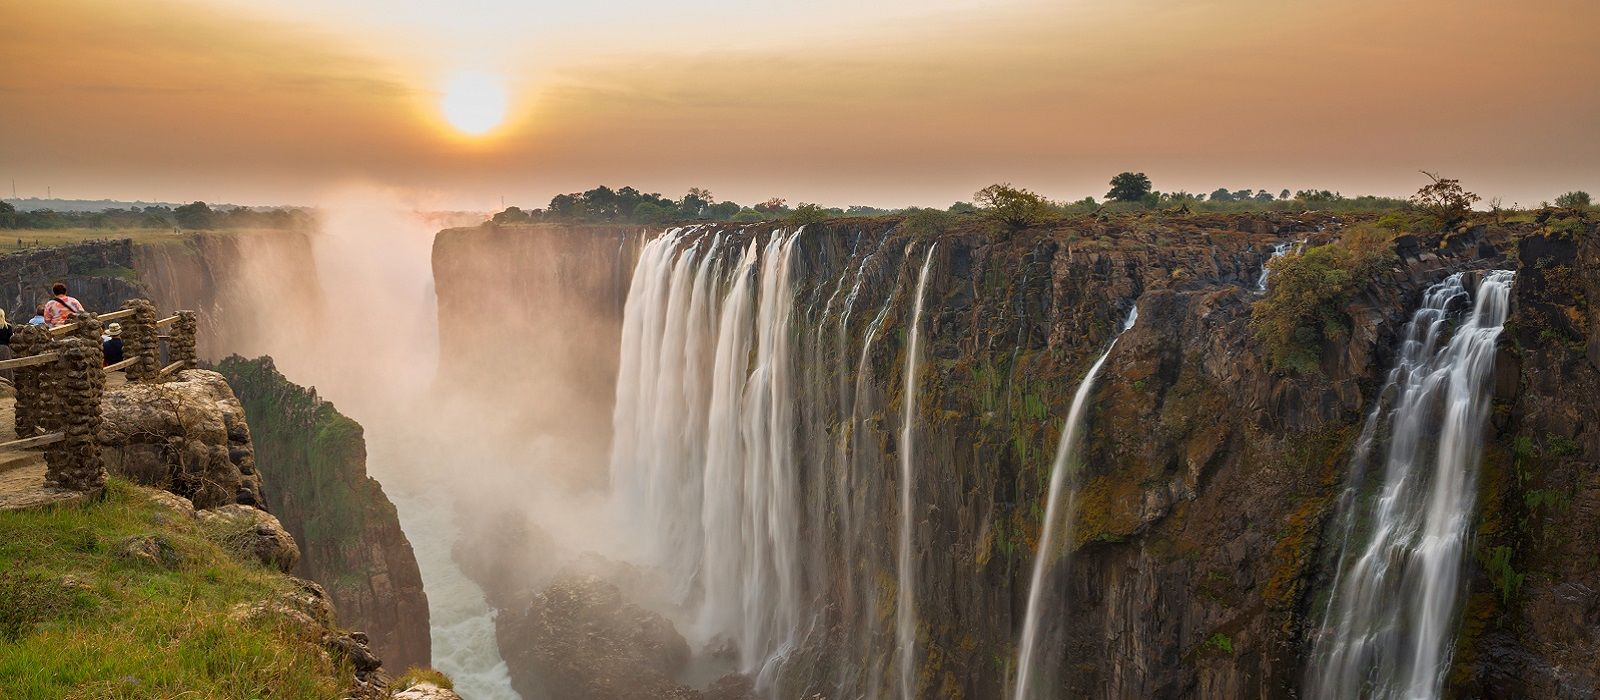 Südafrika, Simbabwe & Botswana: Wilde Tiere & glitzernde Gewässer Urlaub 3